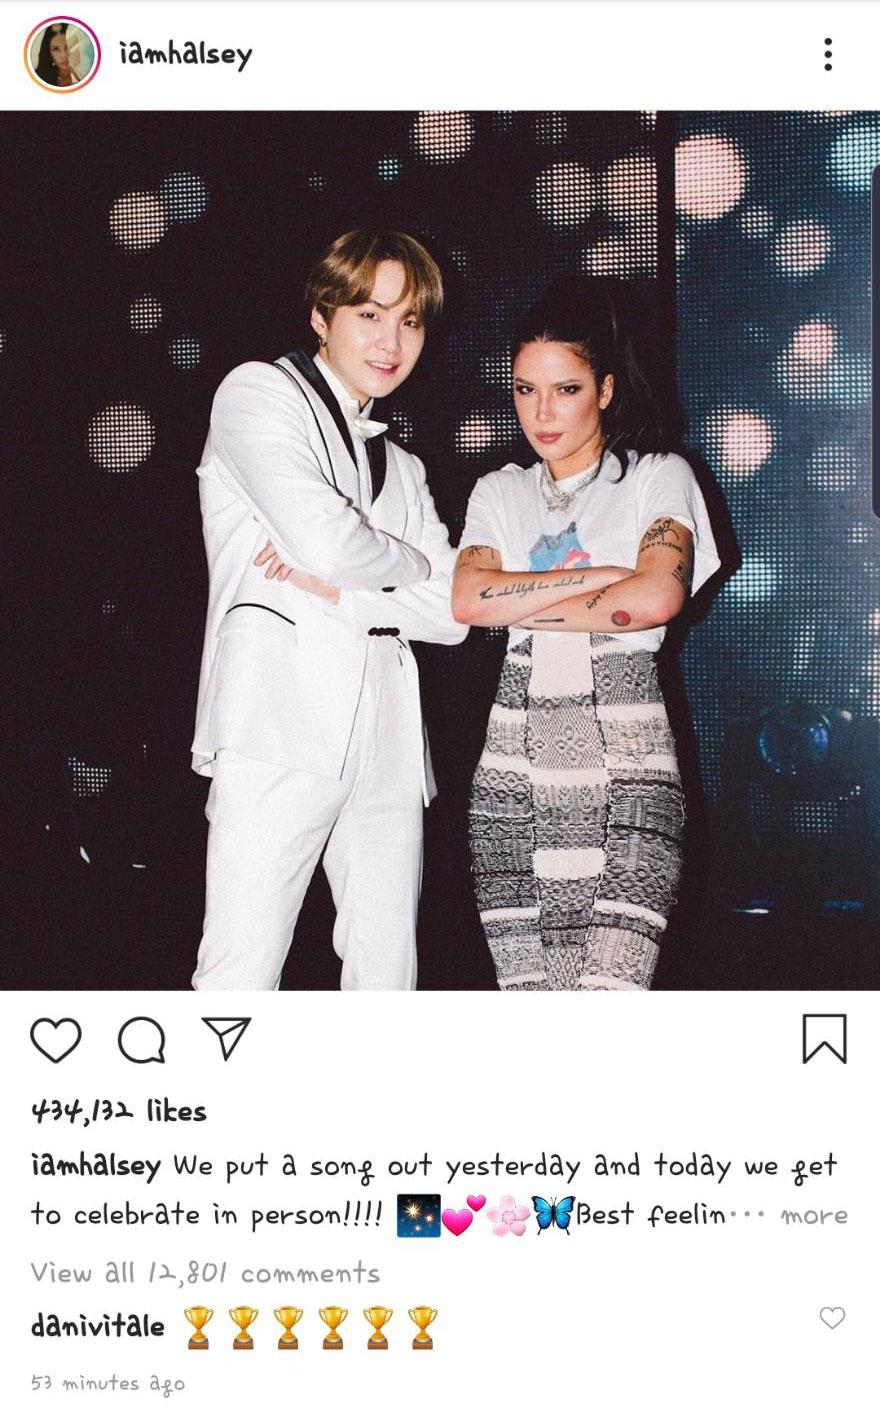 halsey-instagram-post-cropped